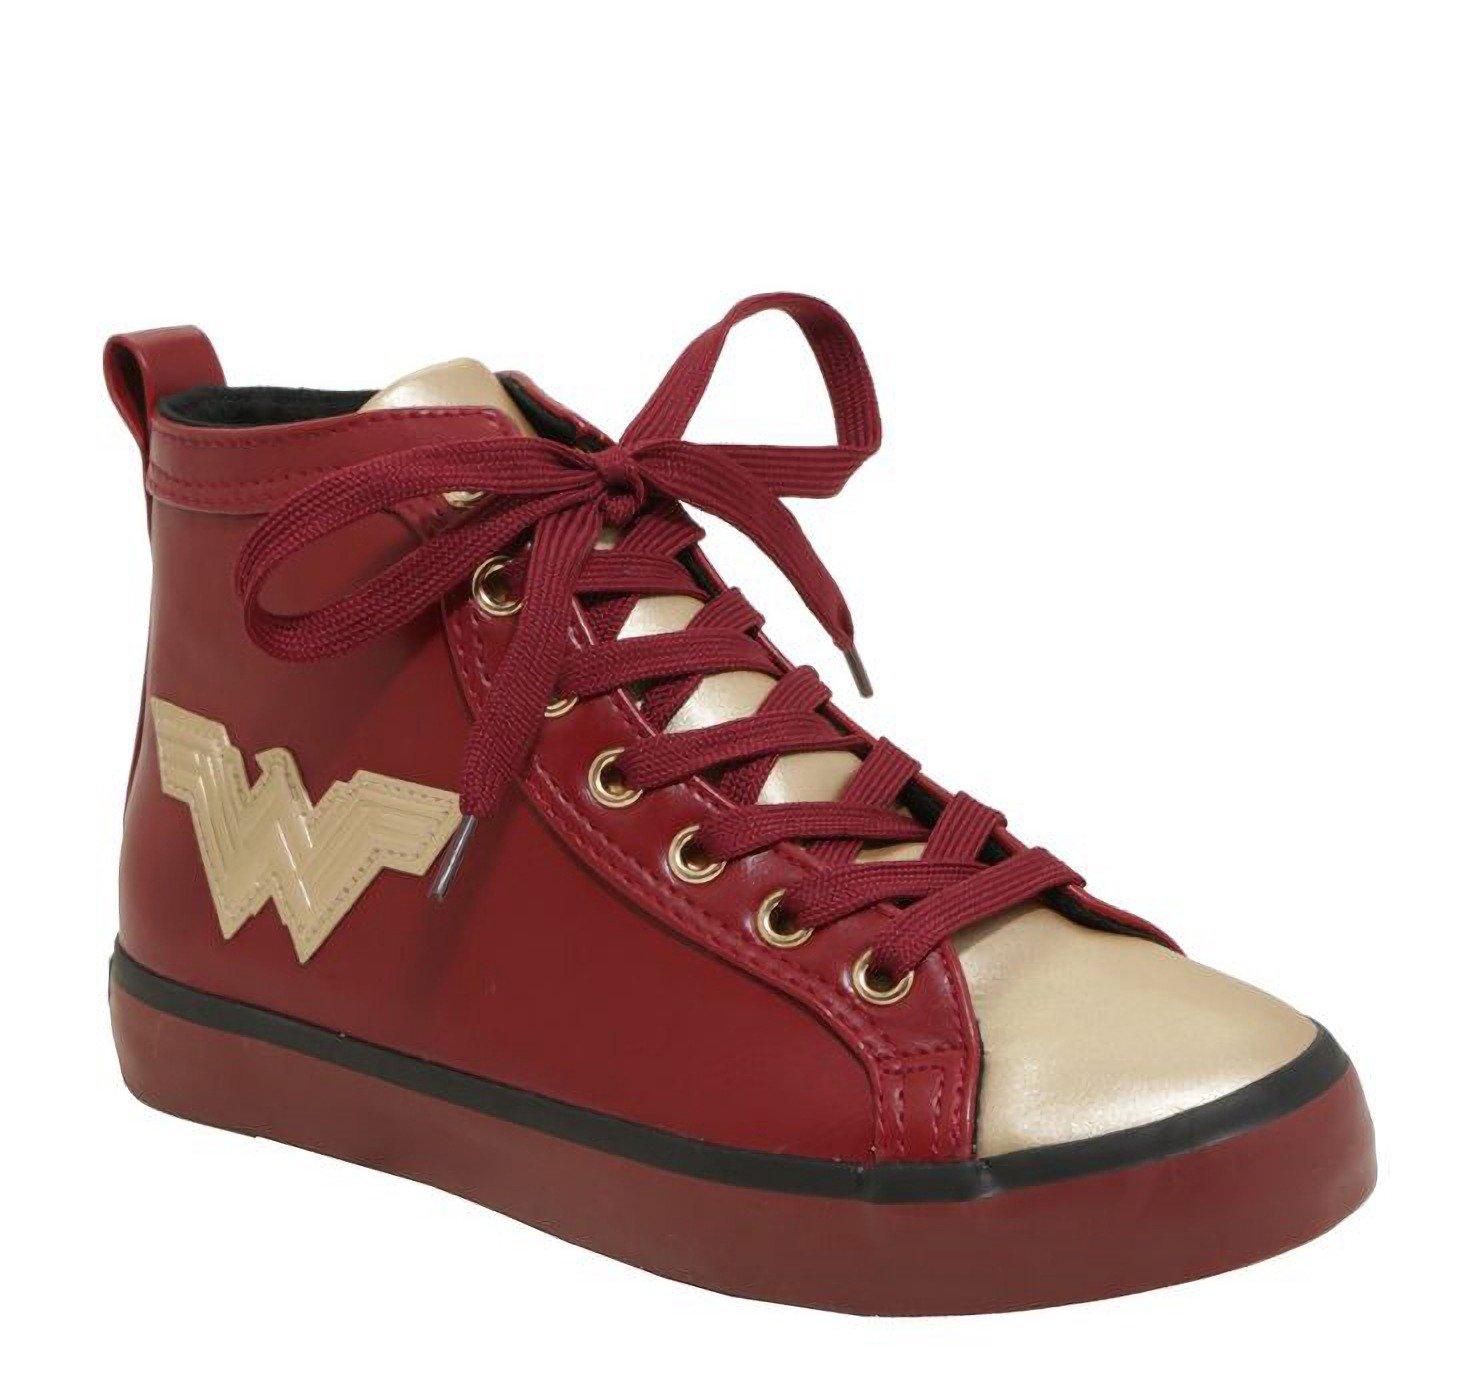 DC Comics Women's Ladies Wonder High Top Sneaker B076CDRNQX 5 B(M) US|Maroon